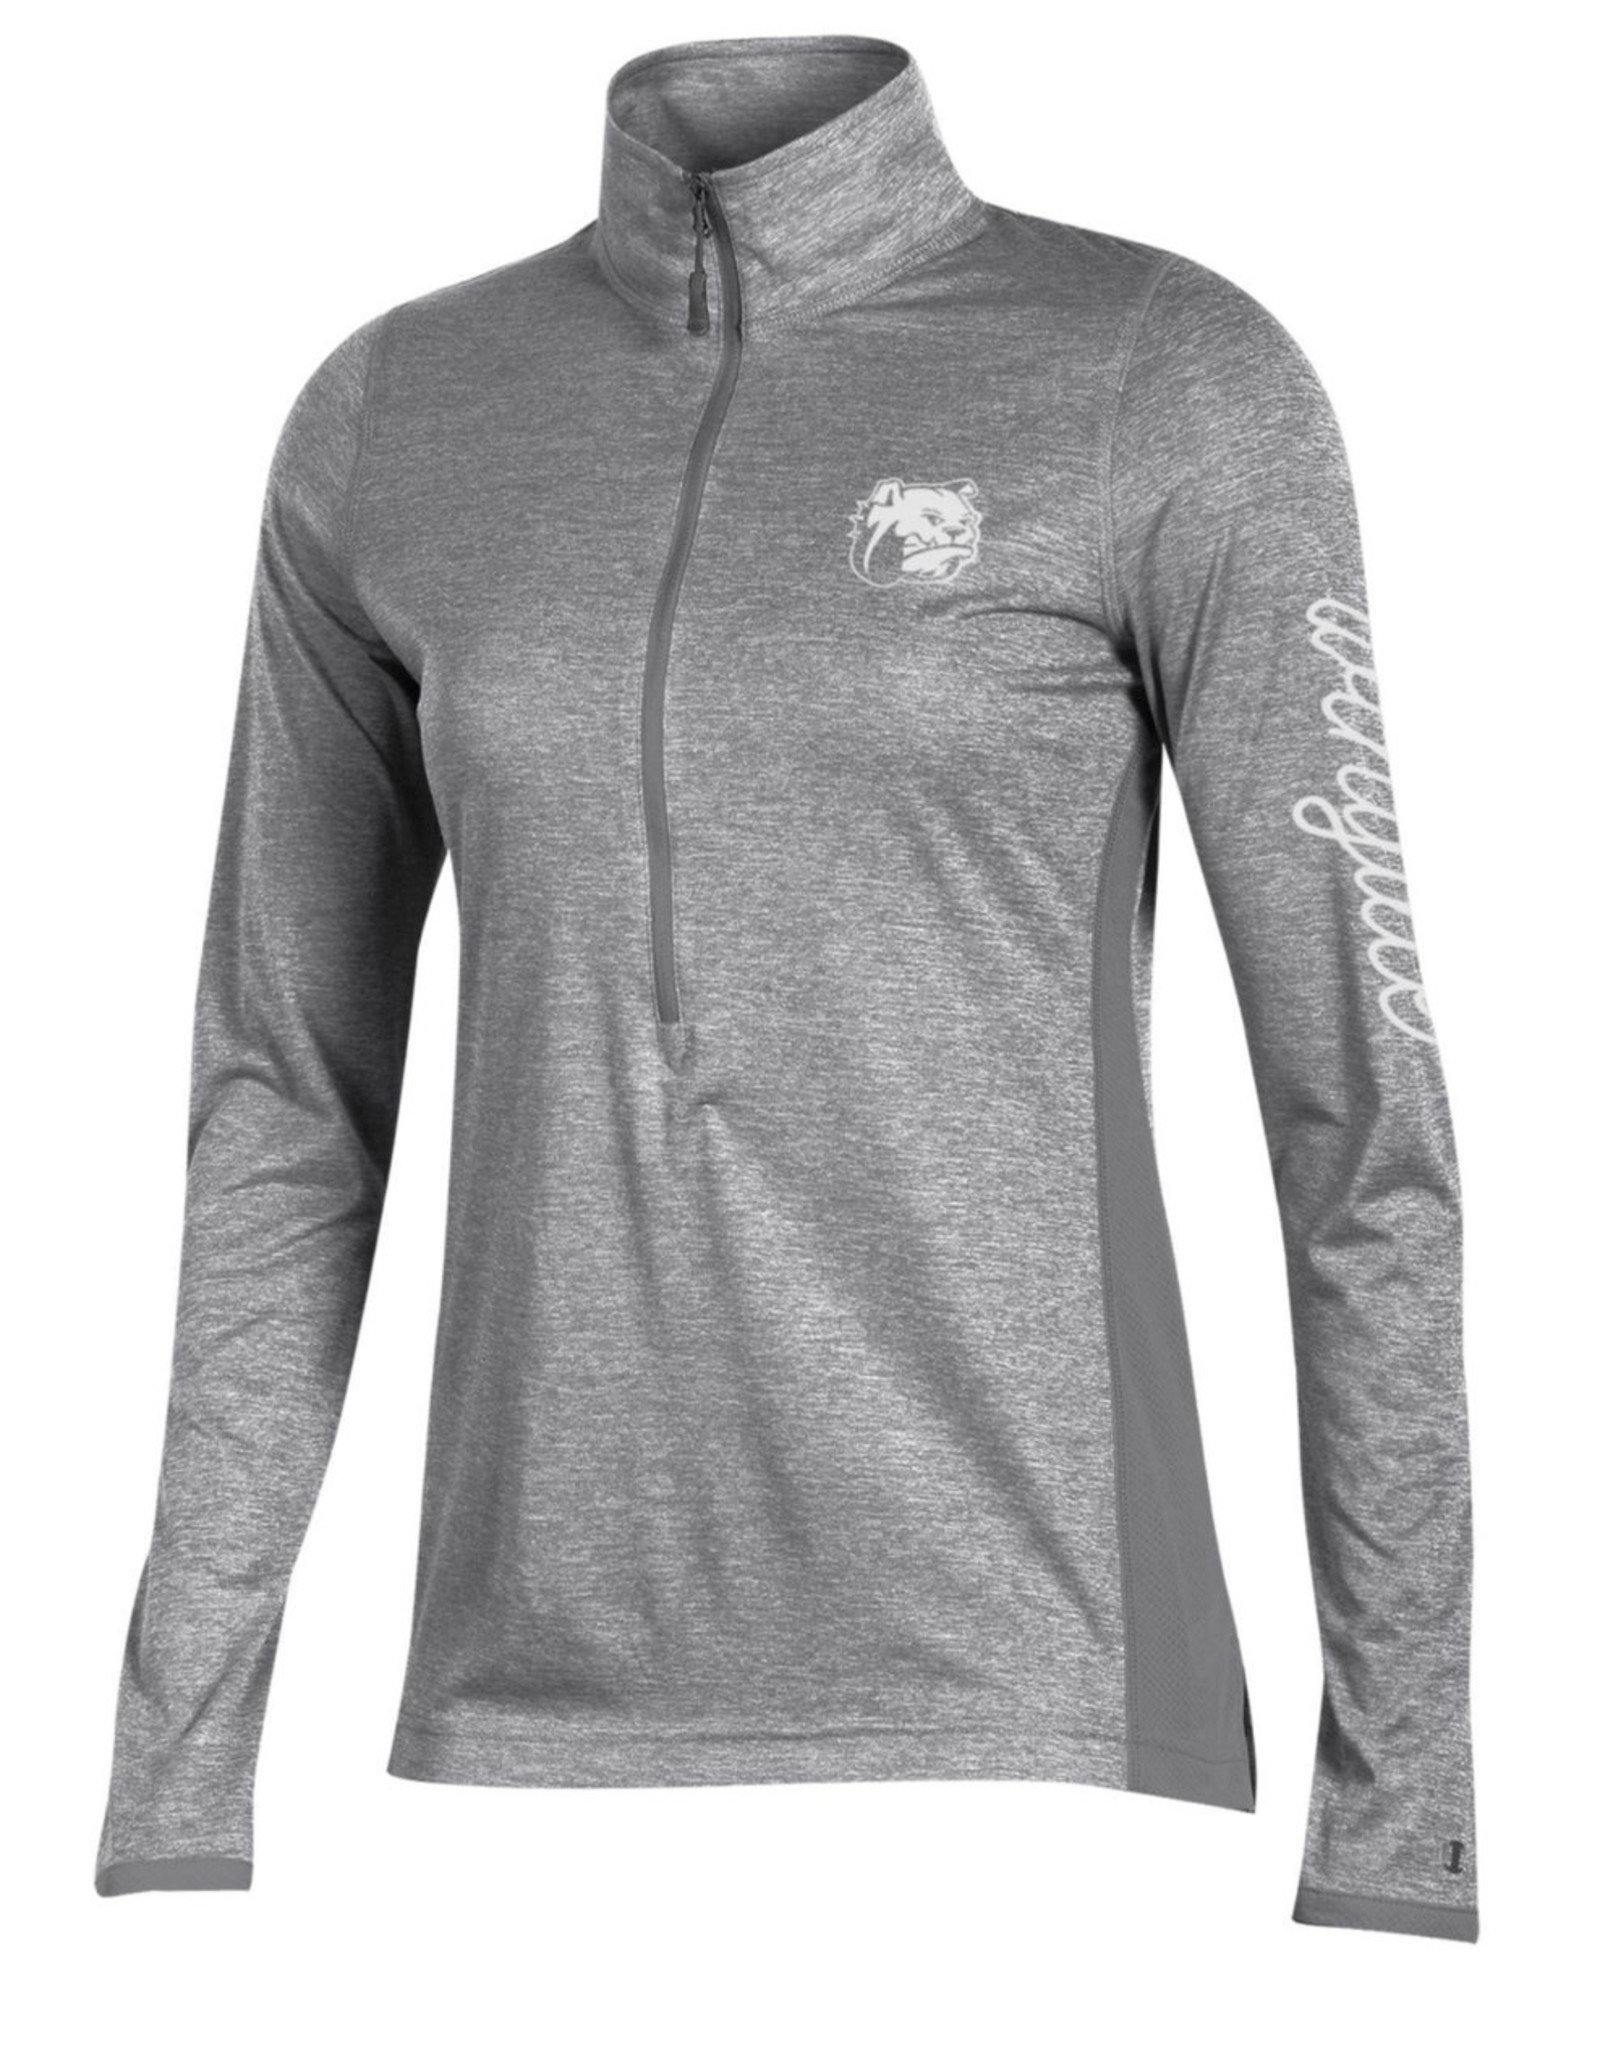 Ladies Marathon Grey 1/2 Zip